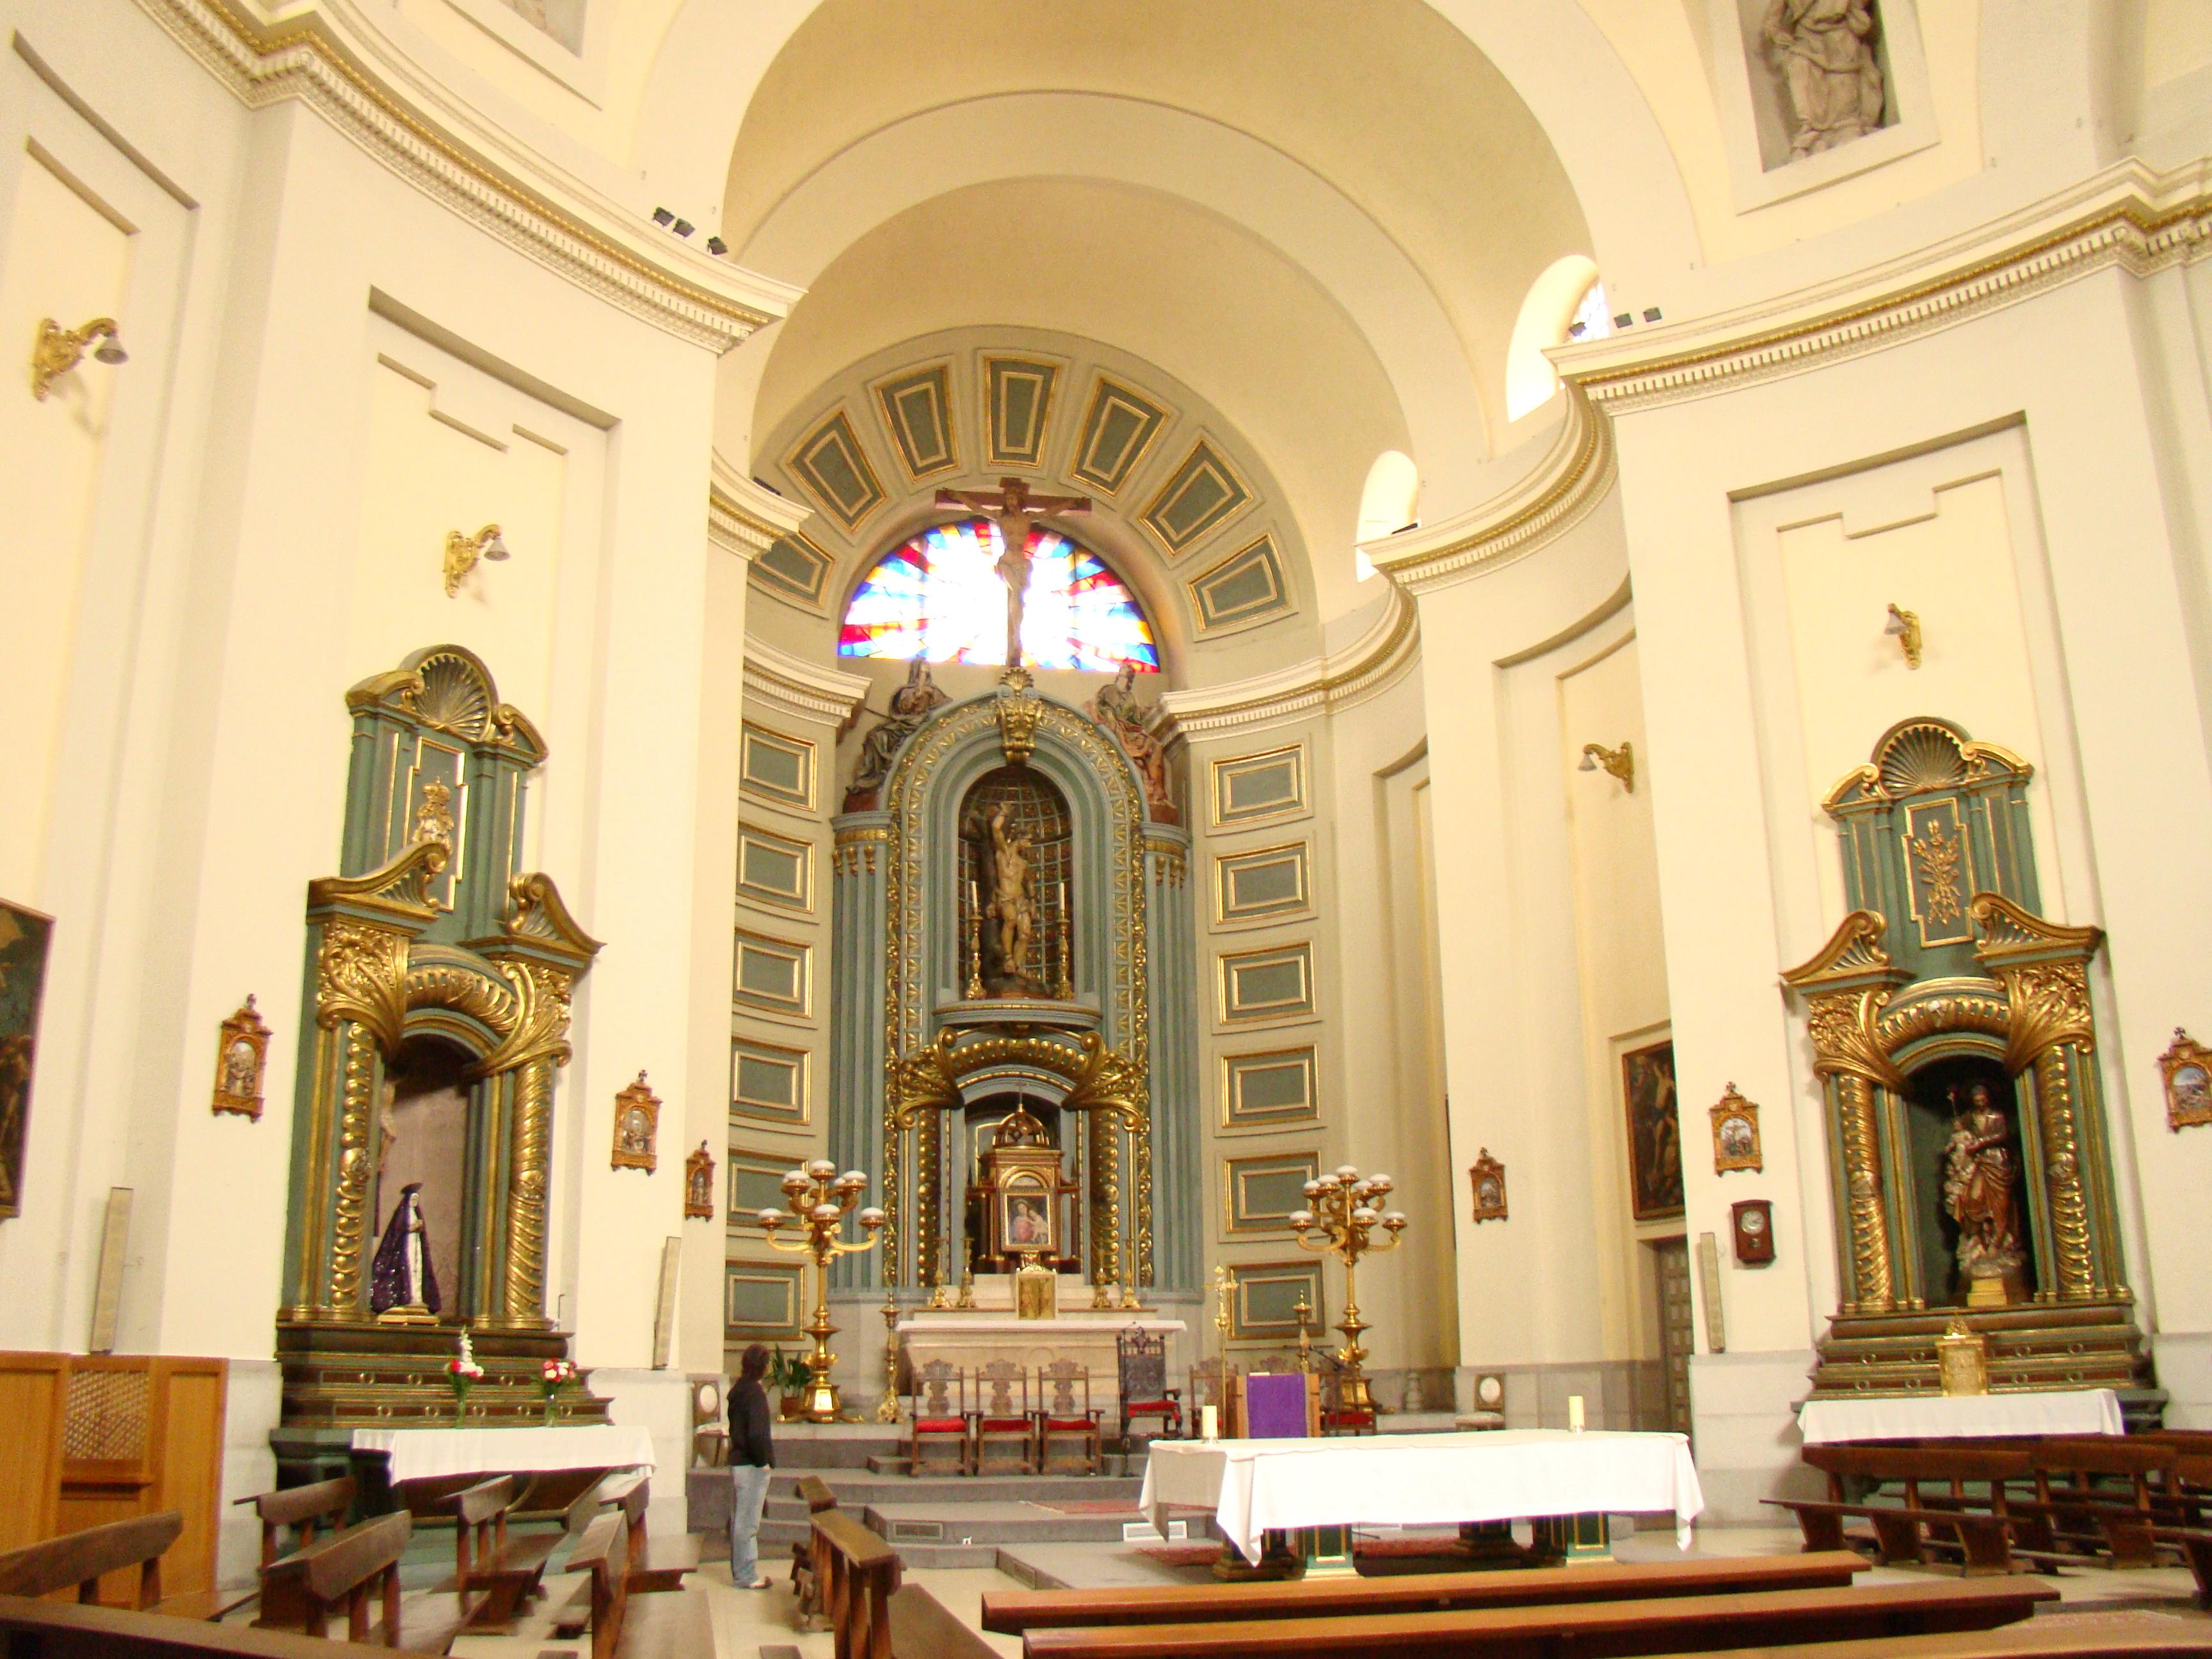 external image Espa%C3%B1a_-_Madrid_-_Iglesia_Parroquial_de_San_Sebasti%C3%A1n_-_Interior.JPG